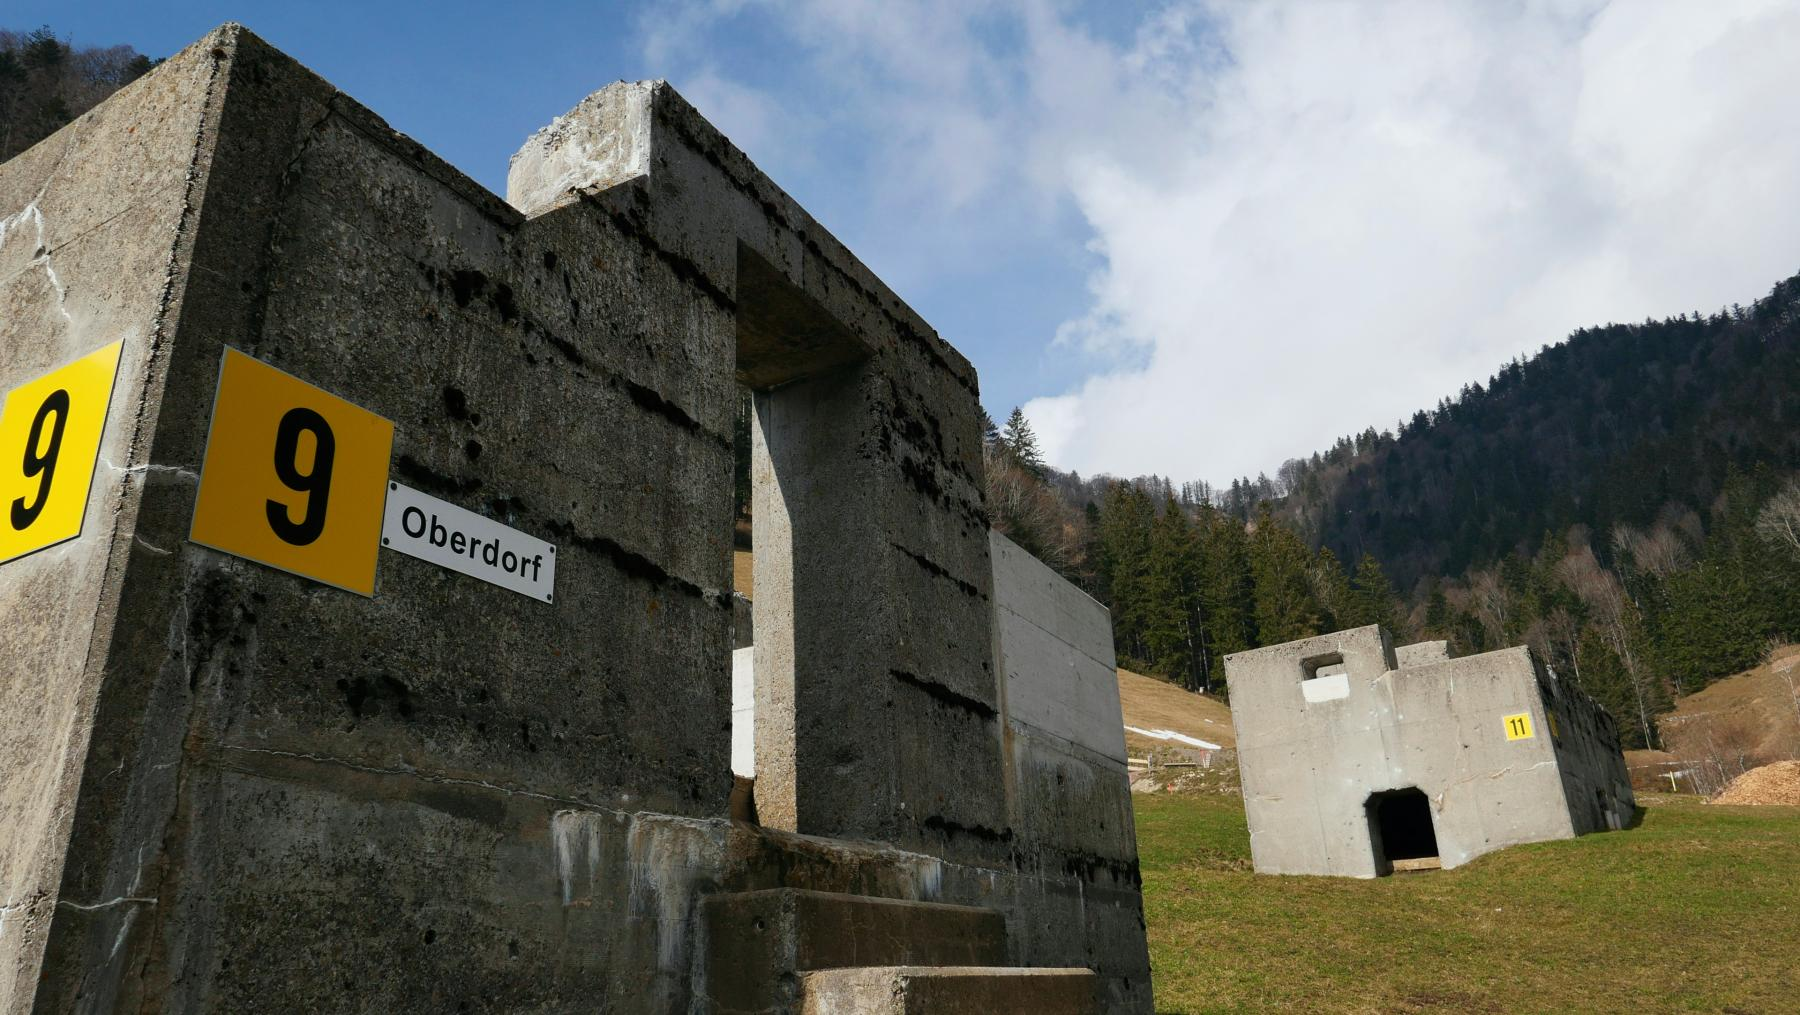 05 Cholloch «Oberdorf»